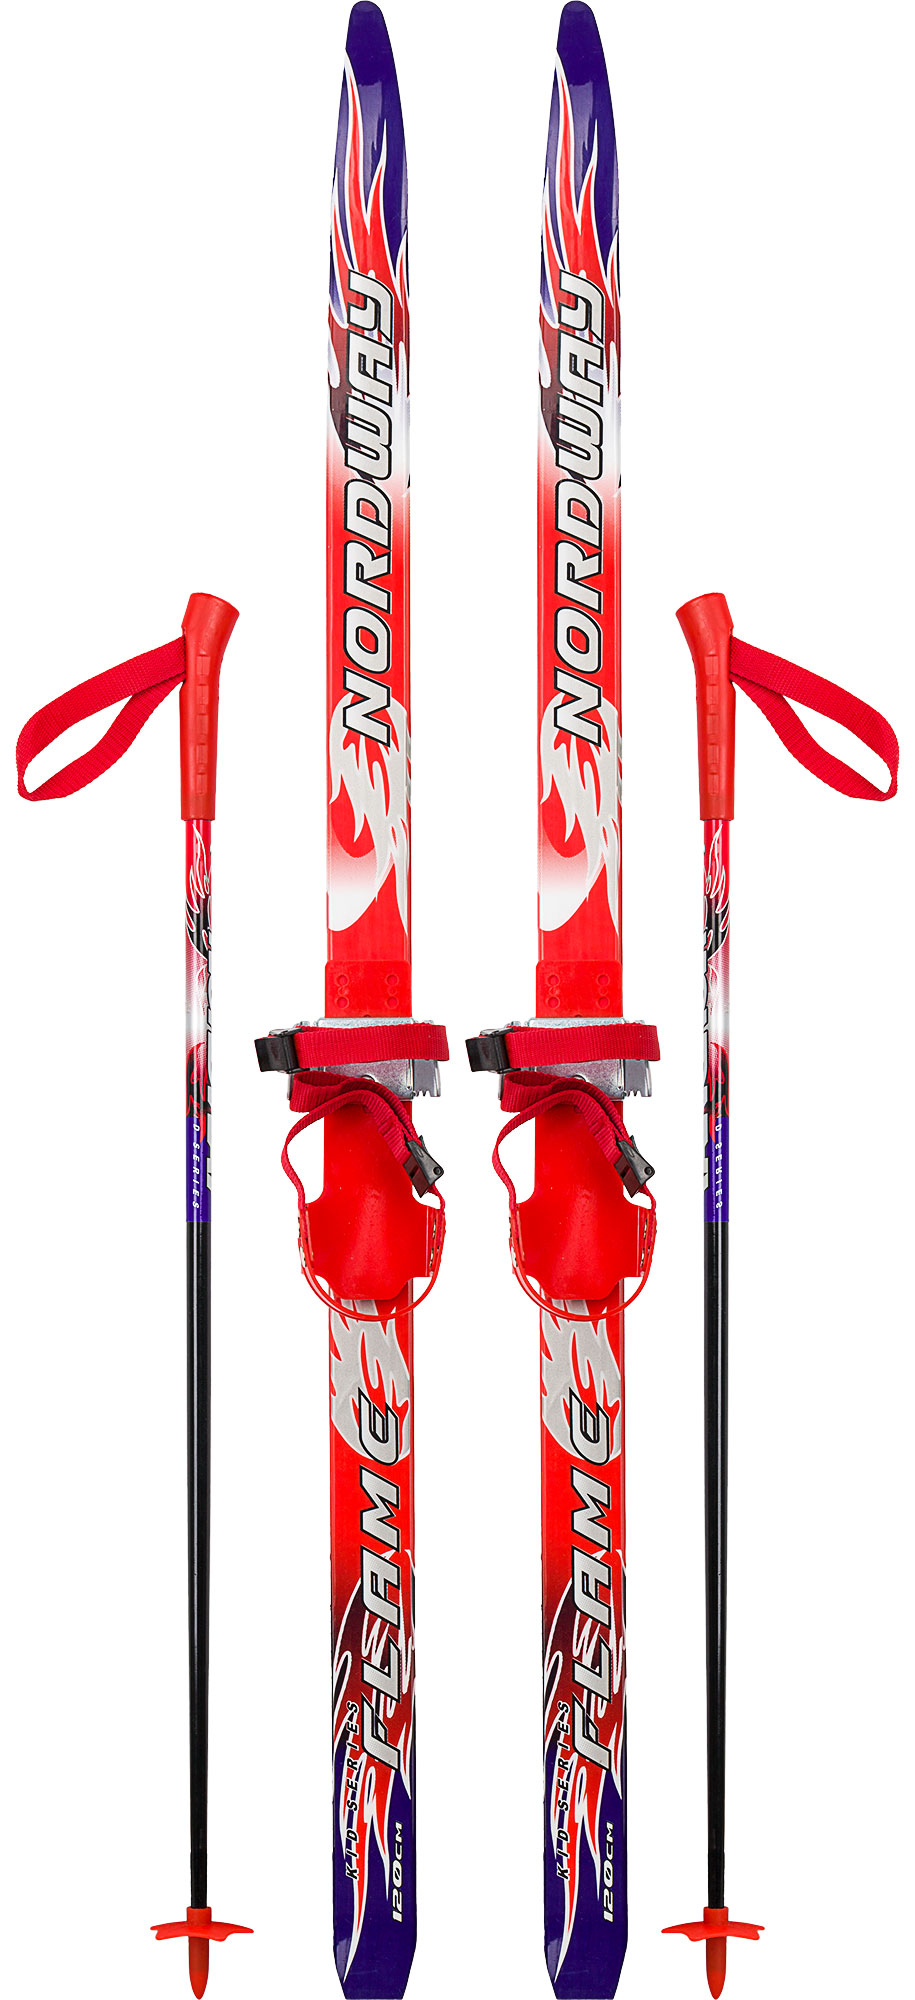 Nordway Комплект лыжный детский Nordway Flame Soft